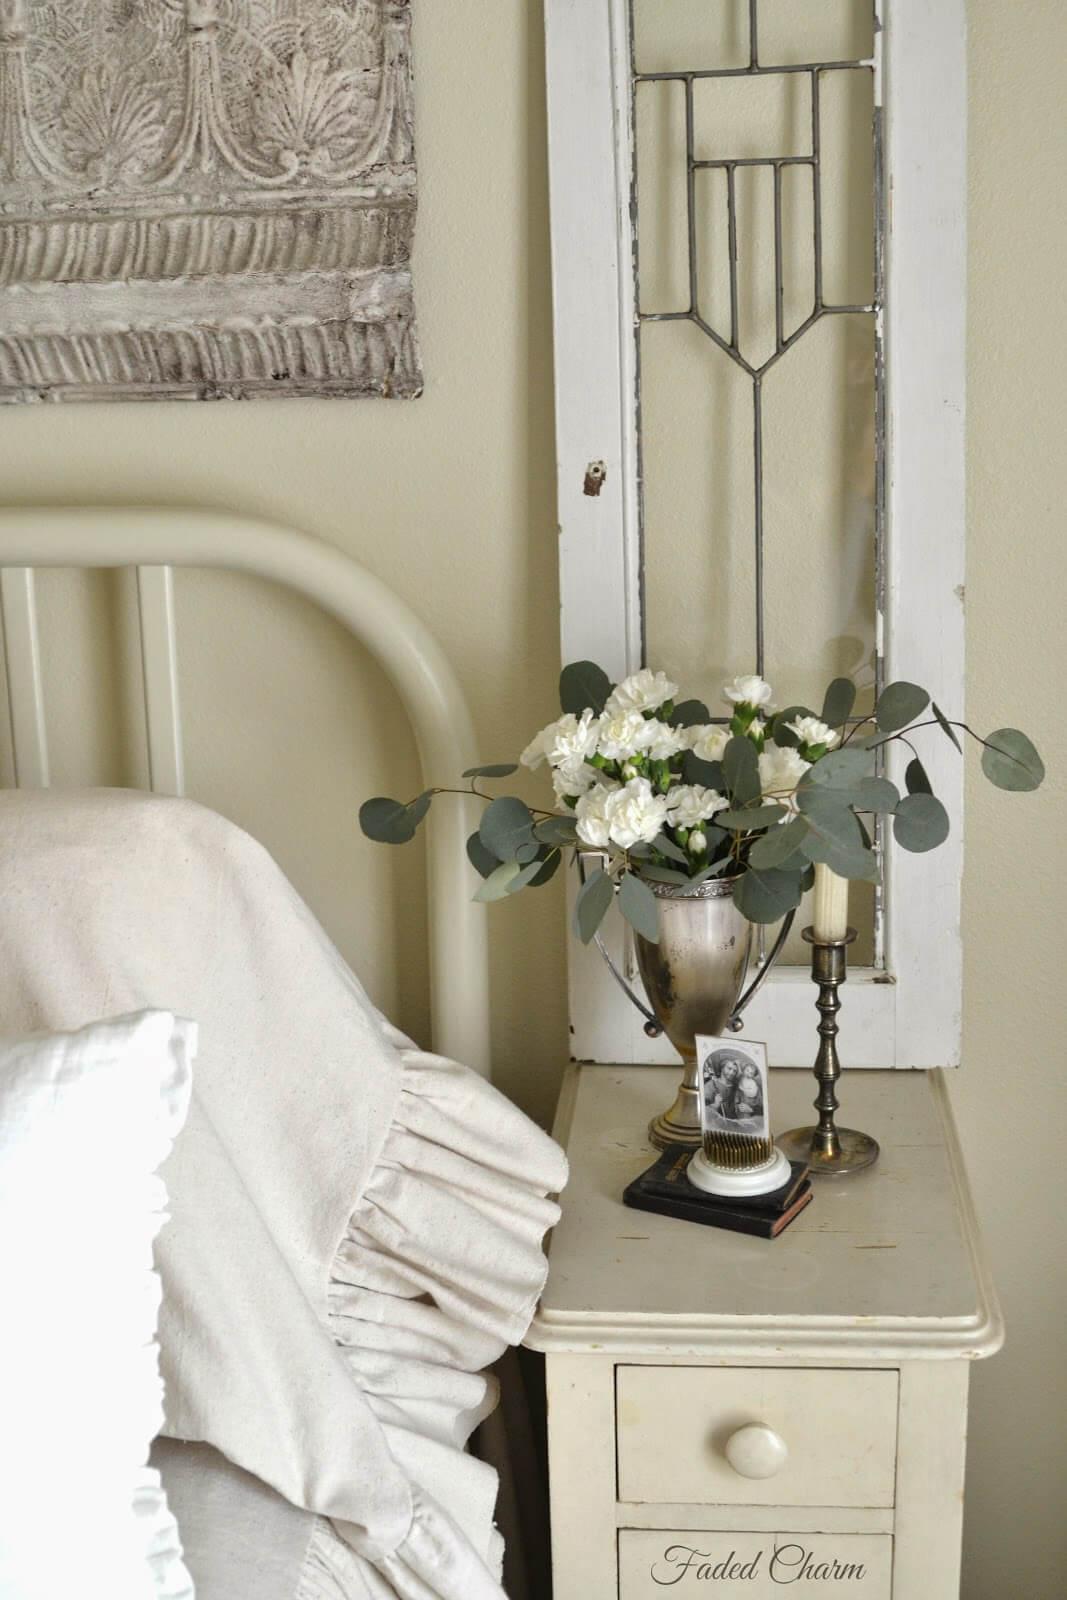 Window Frames as Bedroom Décor